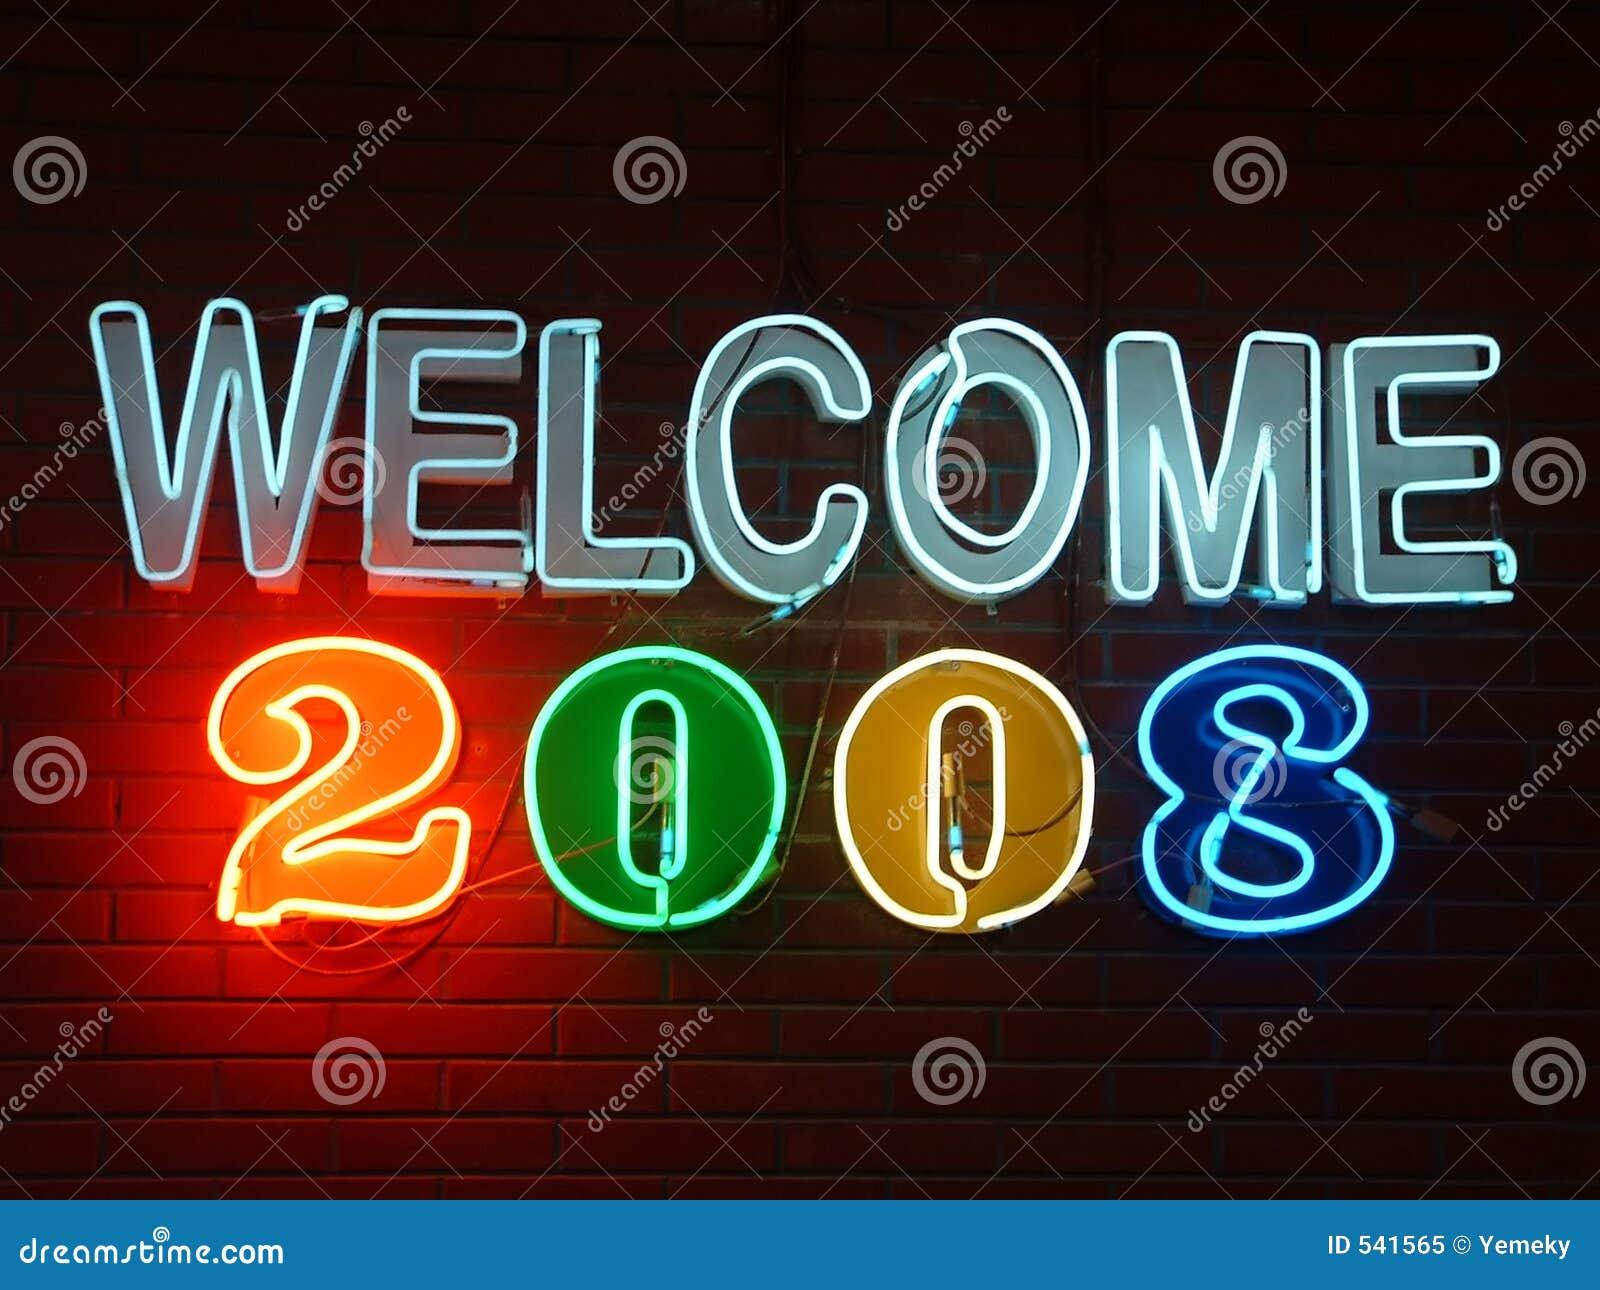 Download 2008霓虹灯广告欢迎 库存图片. 图片 包括有 符号, 信号, tittle, 旁观者, 欢迎, 奥林匹克 - 541565